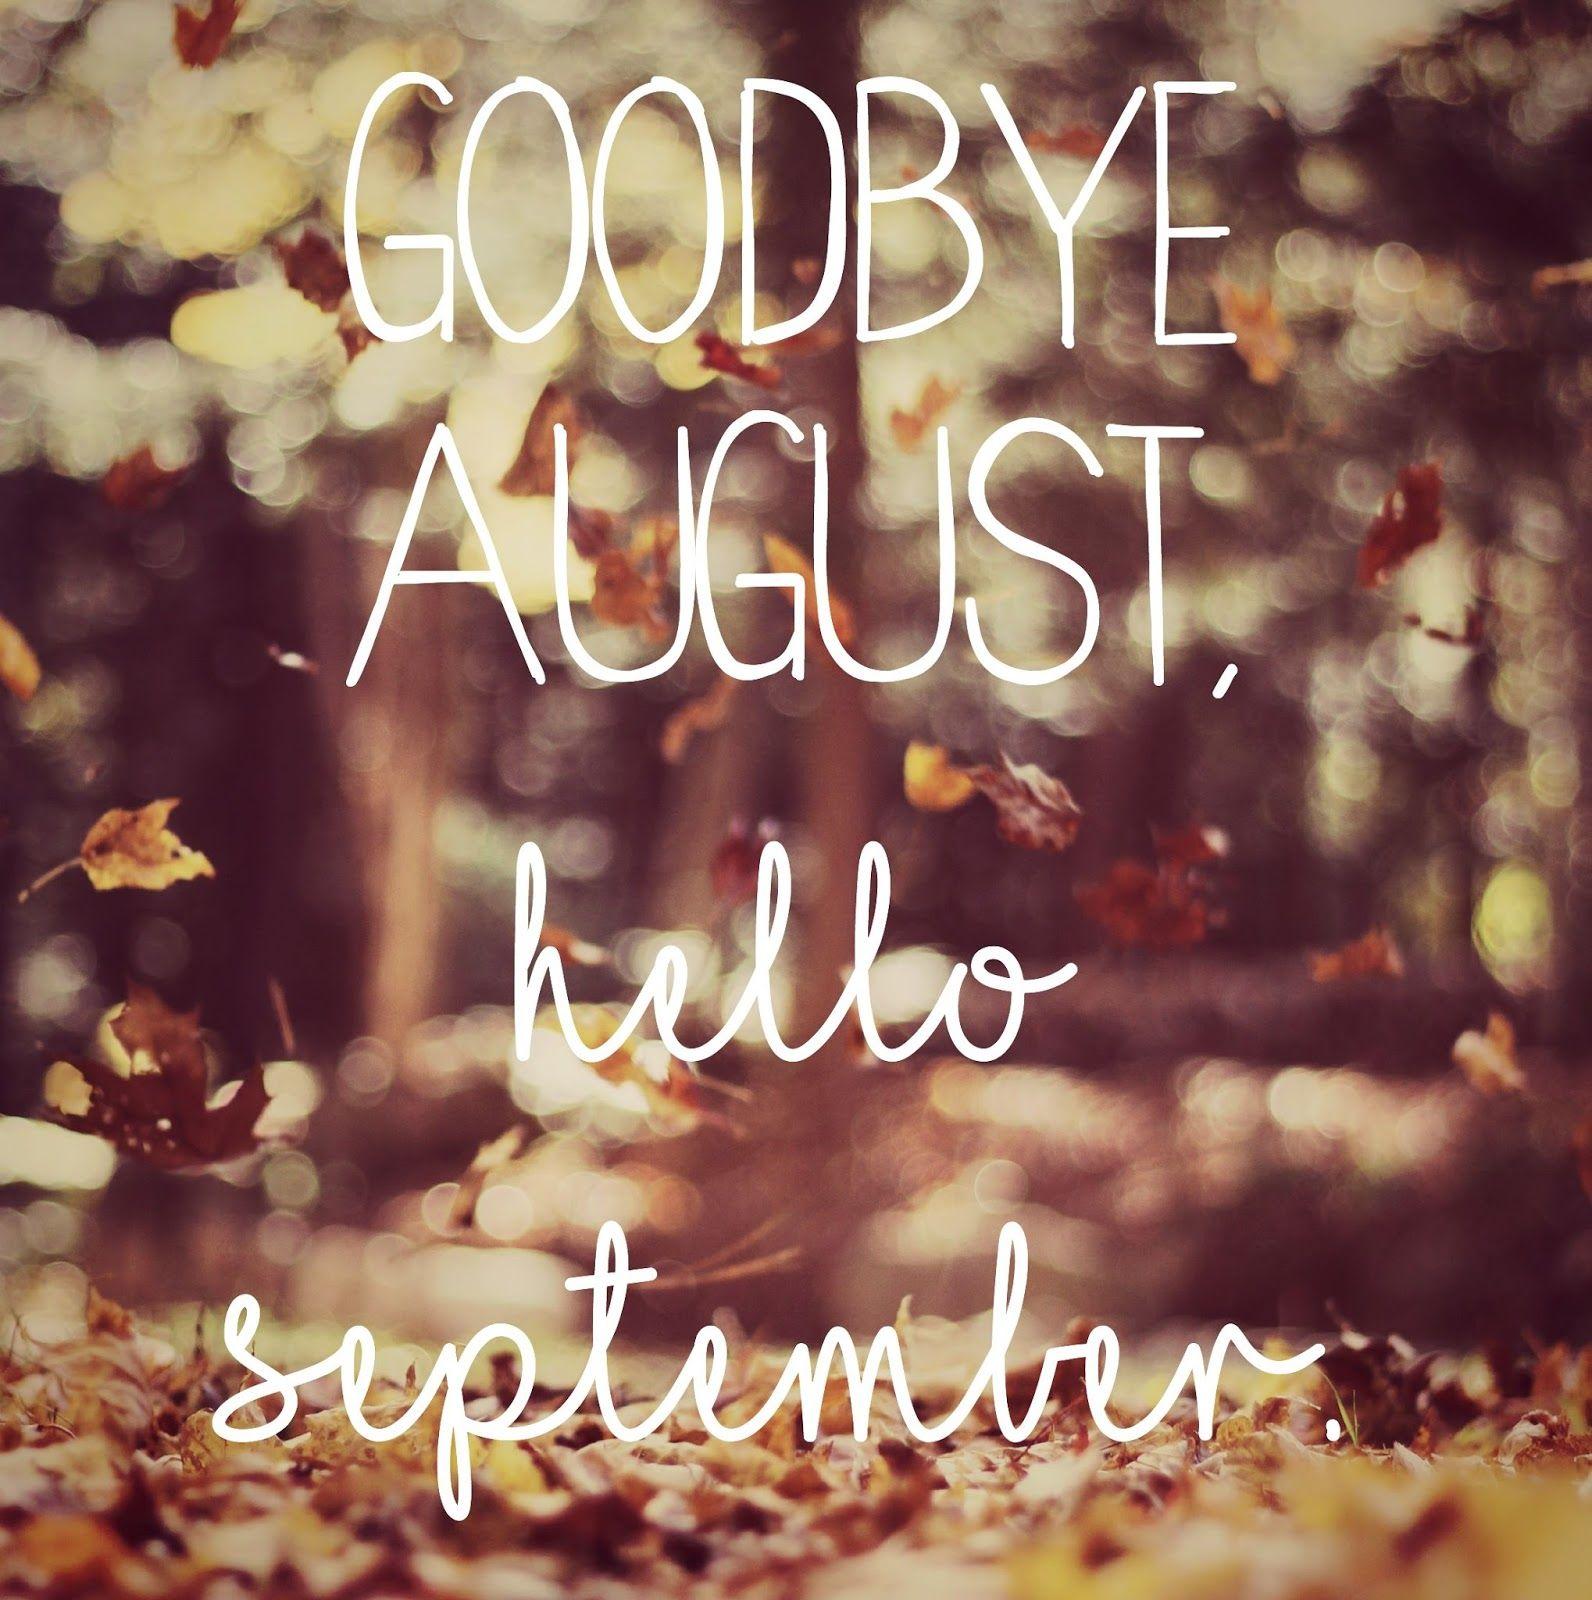 Goodbye August Hello September Images